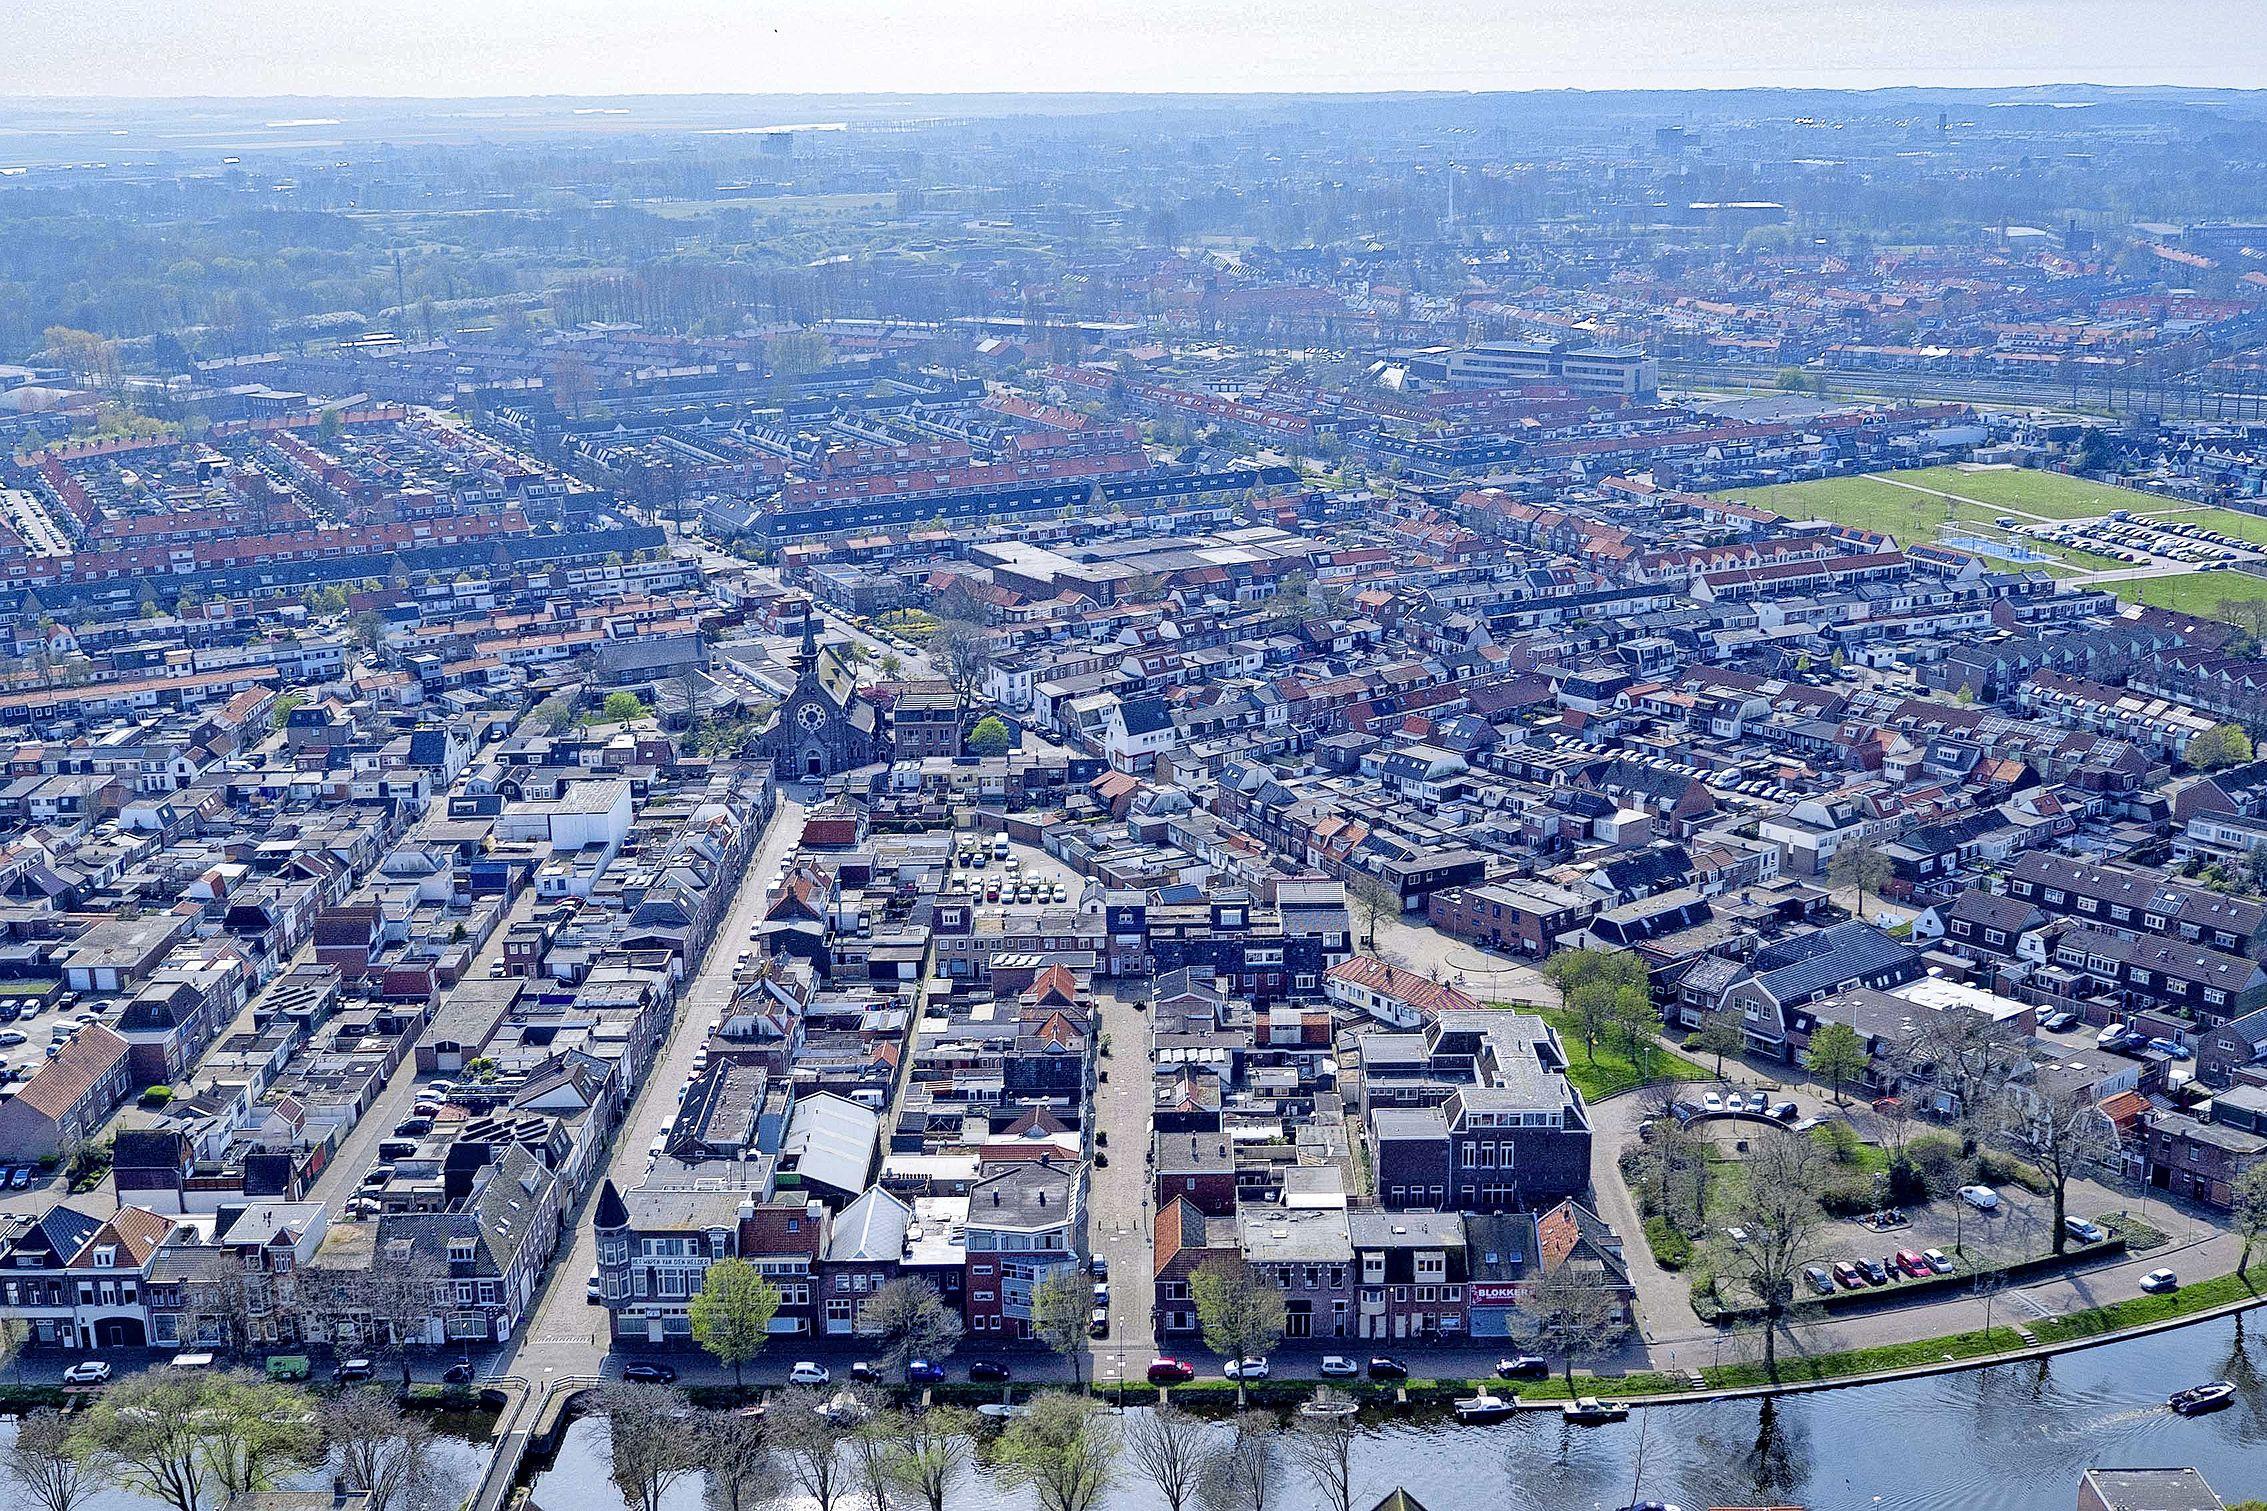 Opgesplitste woning in Den Helder is minimaal honderd vierkante meter. 'Met het oog op woningnood een veel te hoge drempel'